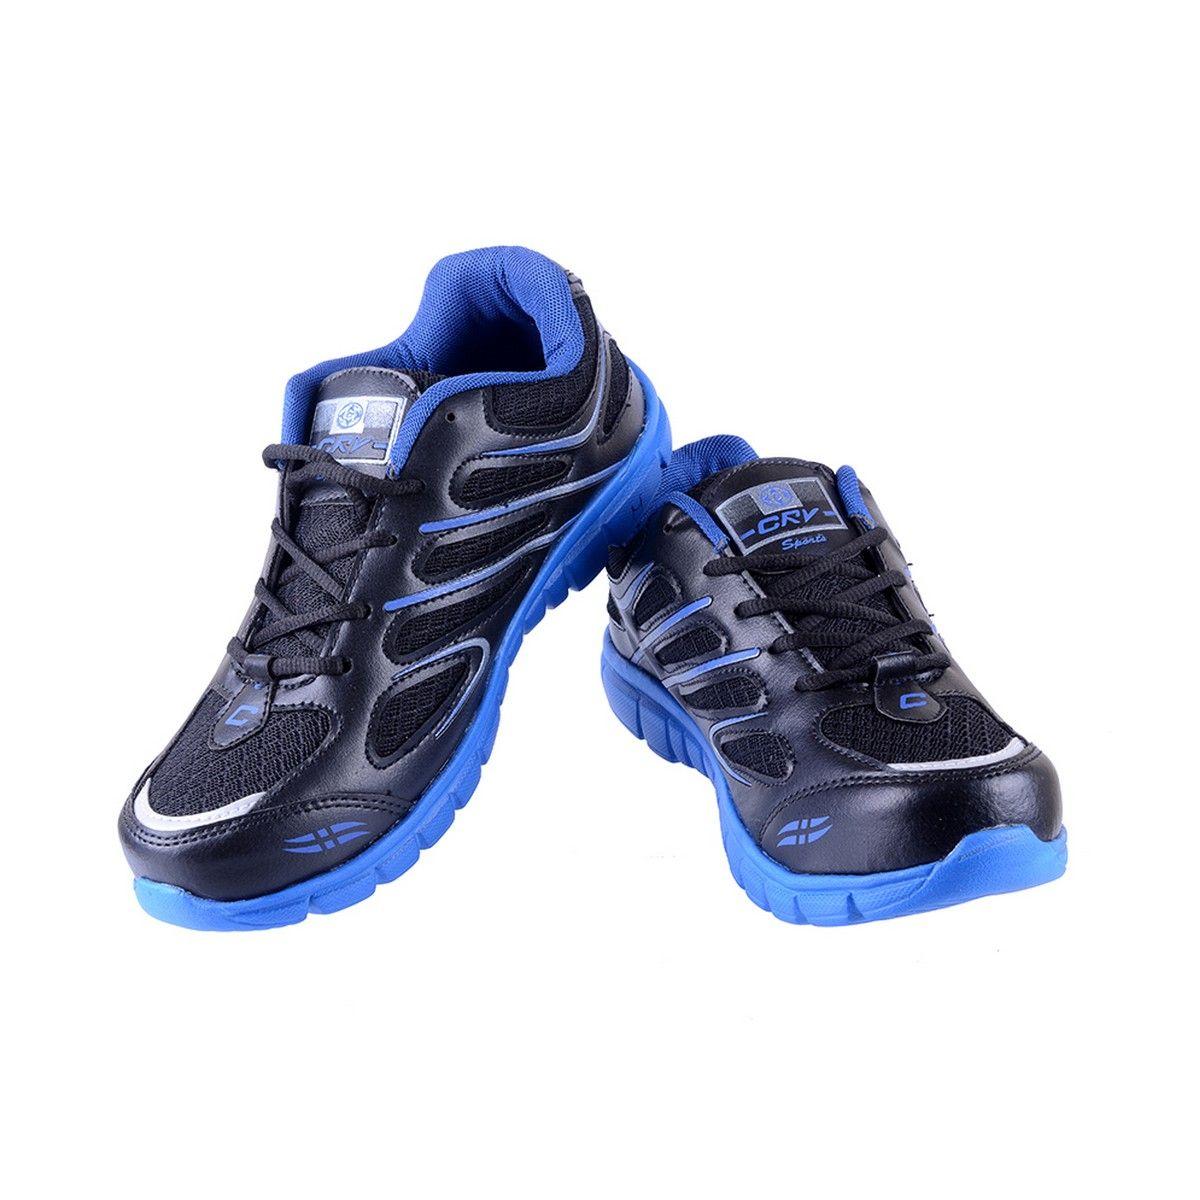 porcupine synthetic sports shoes pn sh ss bk bl black